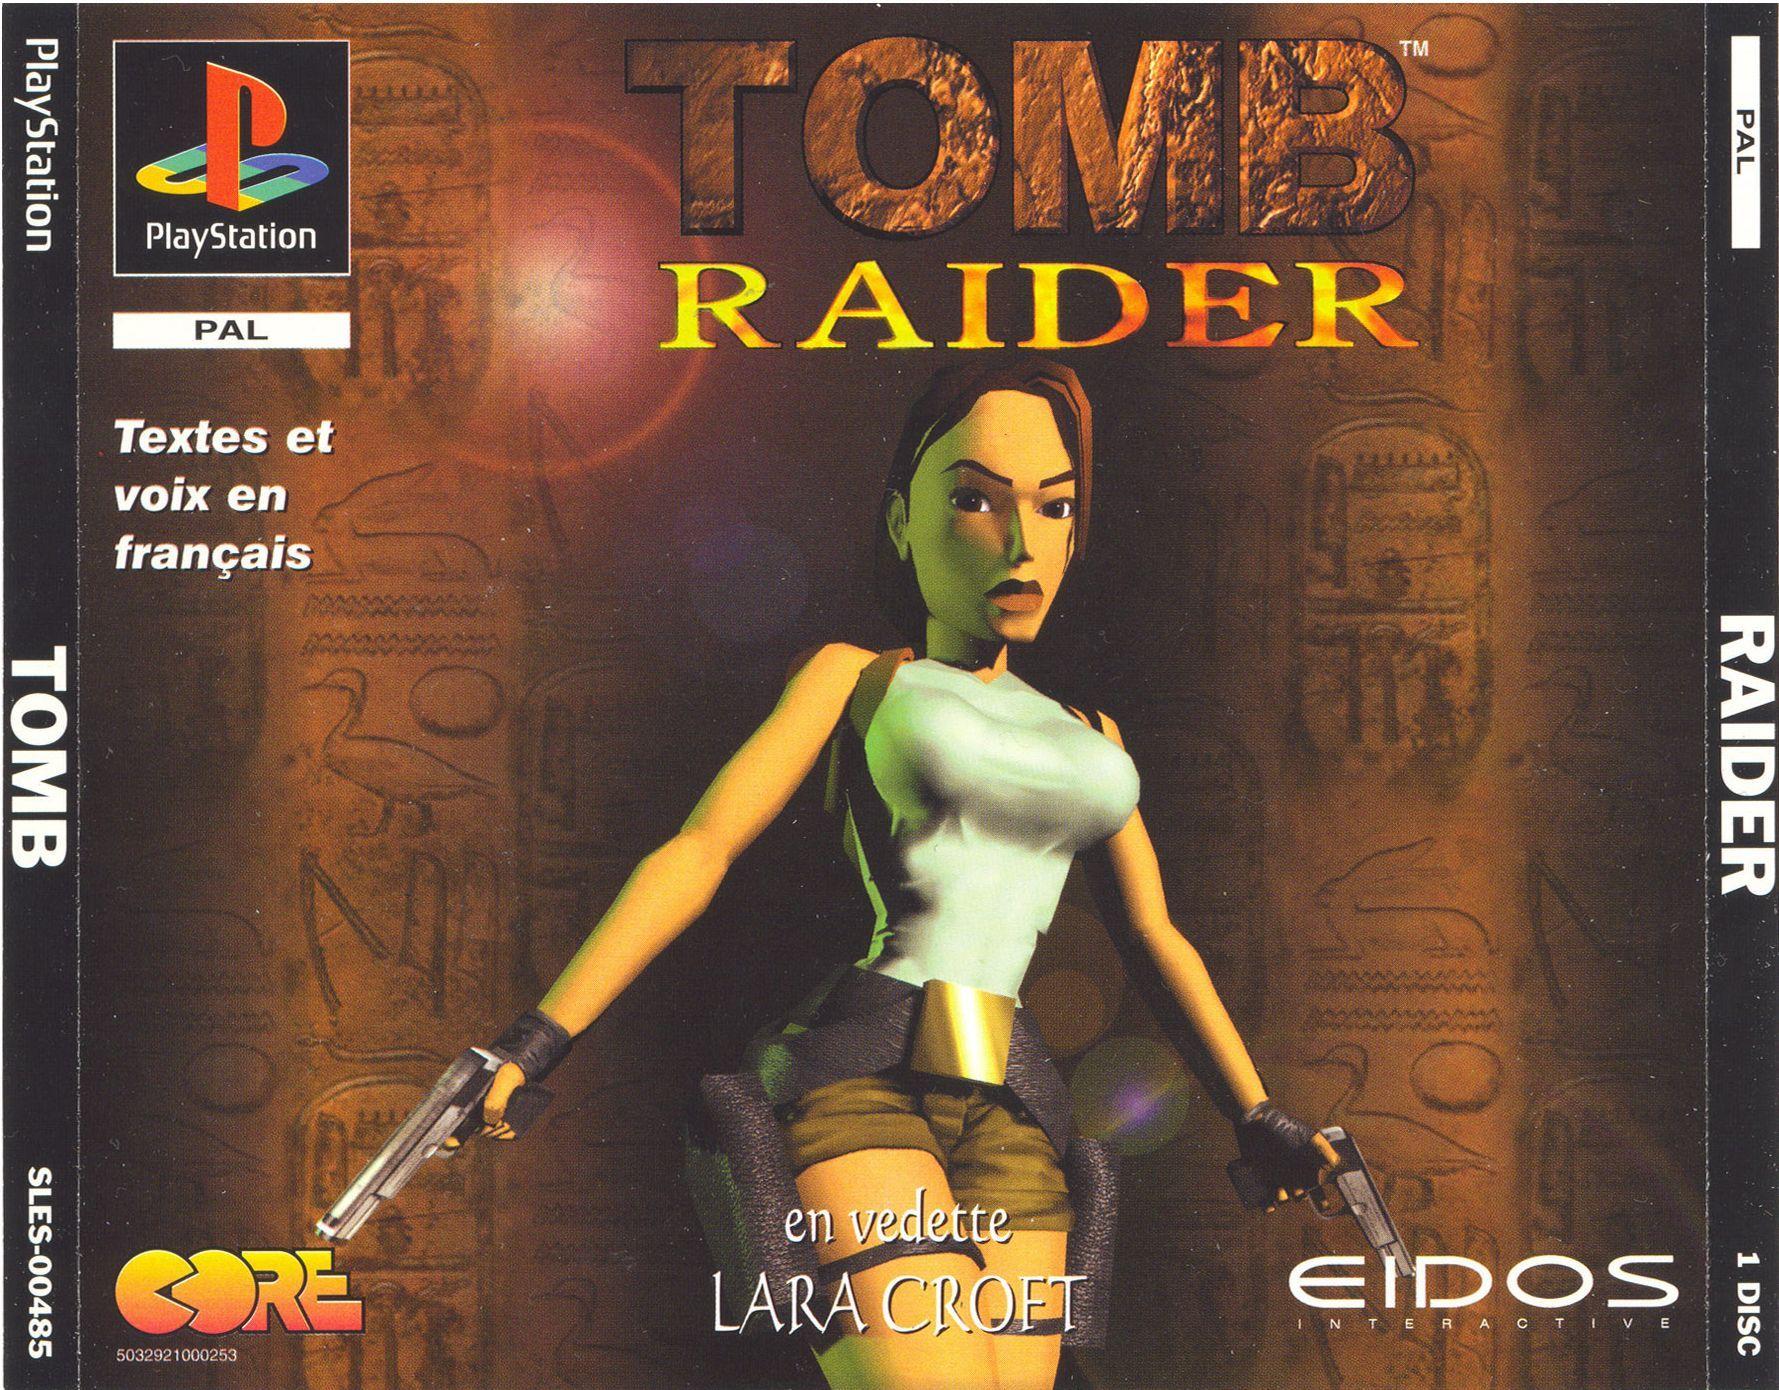 Tomb Raider Pal Front Tomb Raider Game Original Tomb Raider